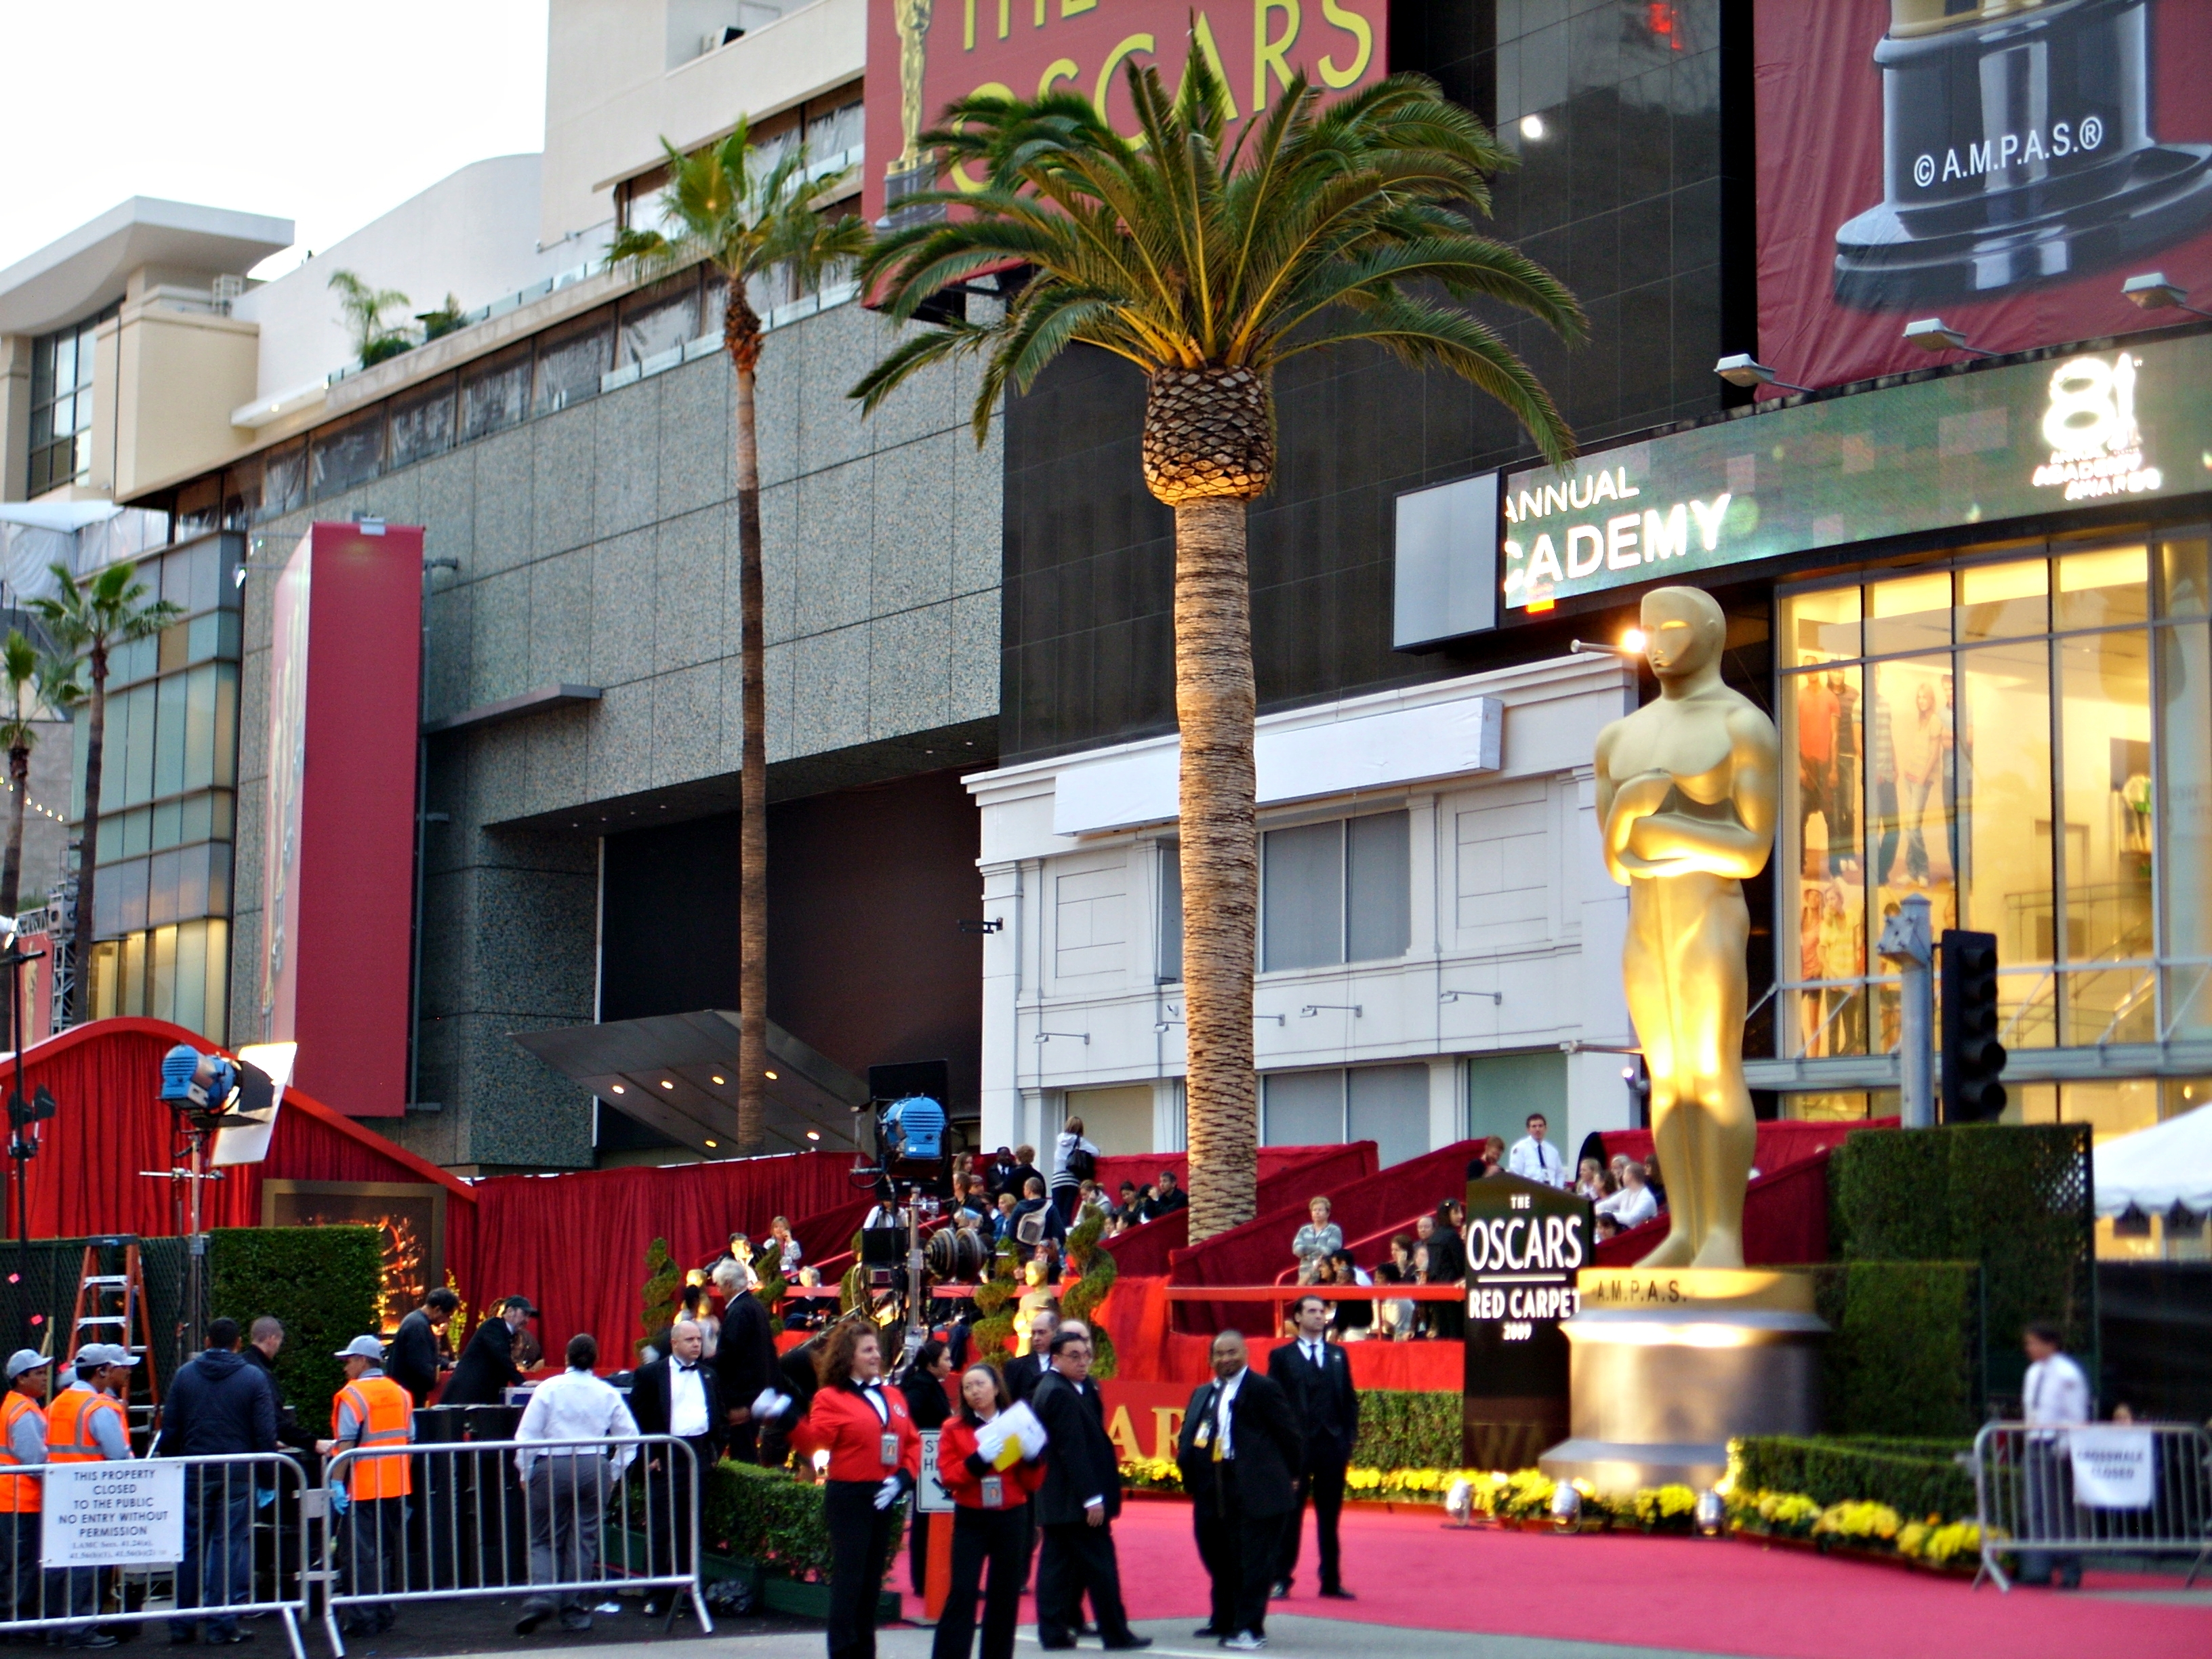 81st Academy Awards Presentations, Kodak Theater, Hollywood, 2009